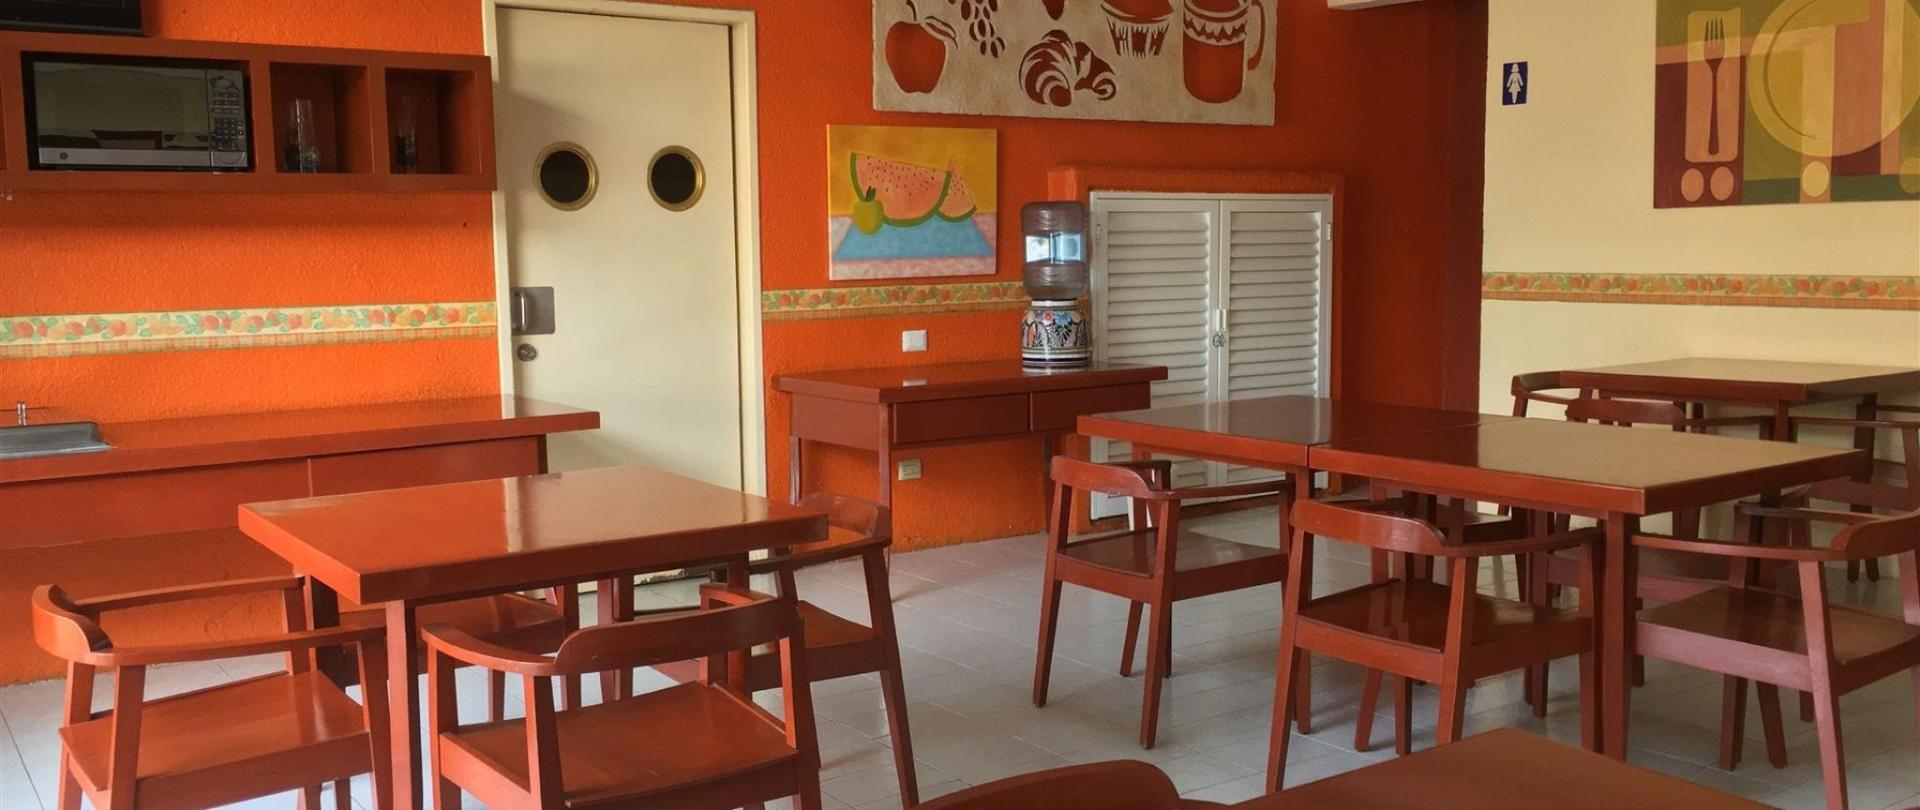 19-cafeteria.jpg